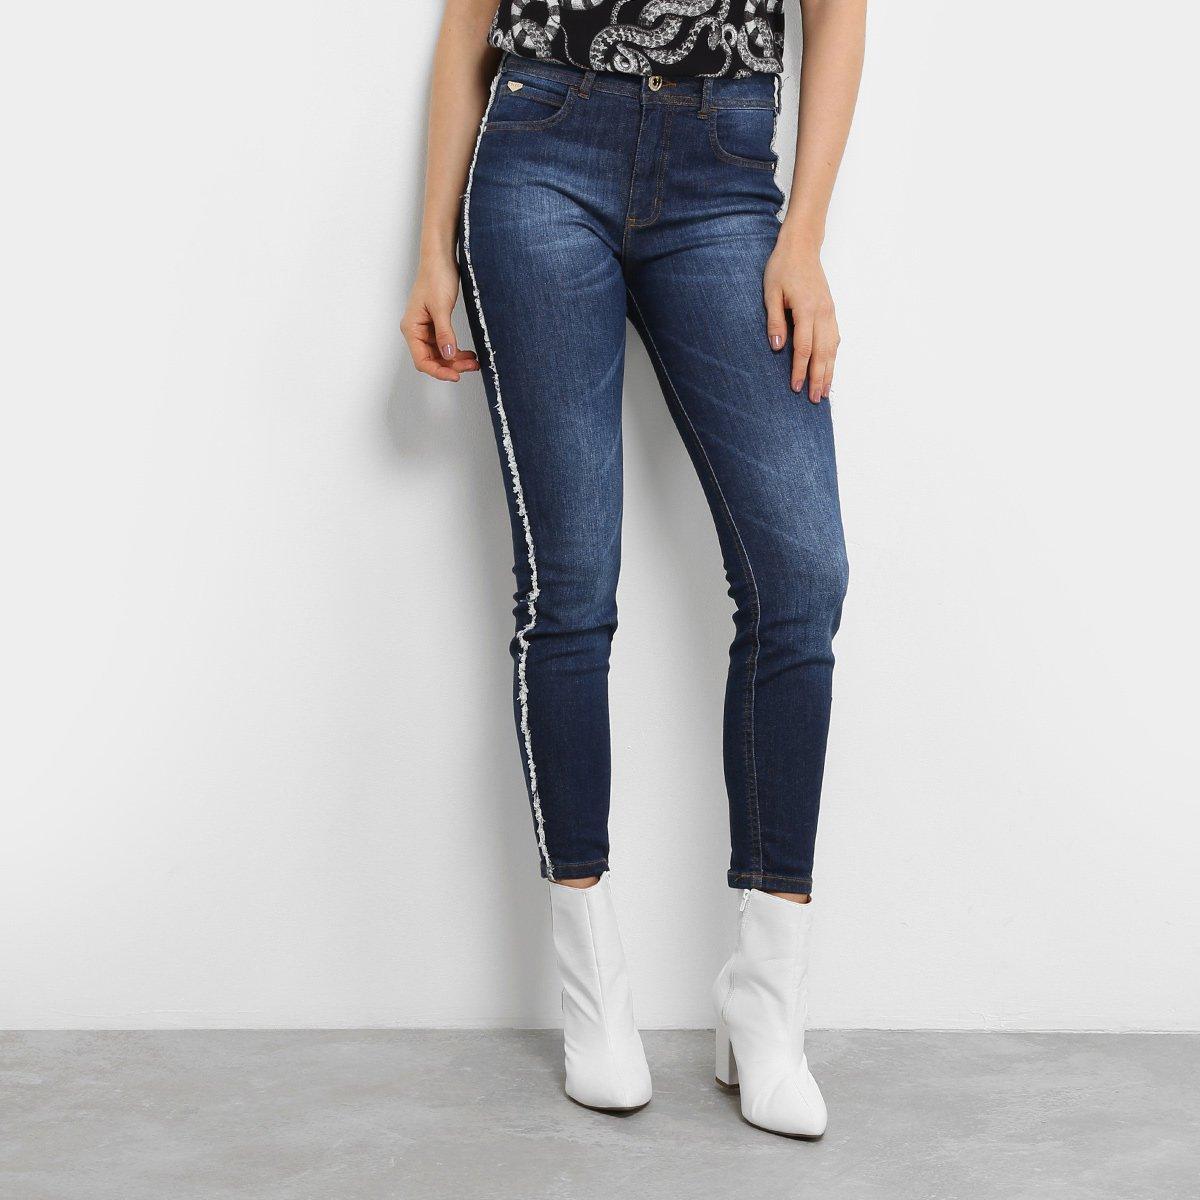 4120180f1 Calça Jeans Skinny Colcci Base Bia Cintura Alta Feminina | Livelo ...